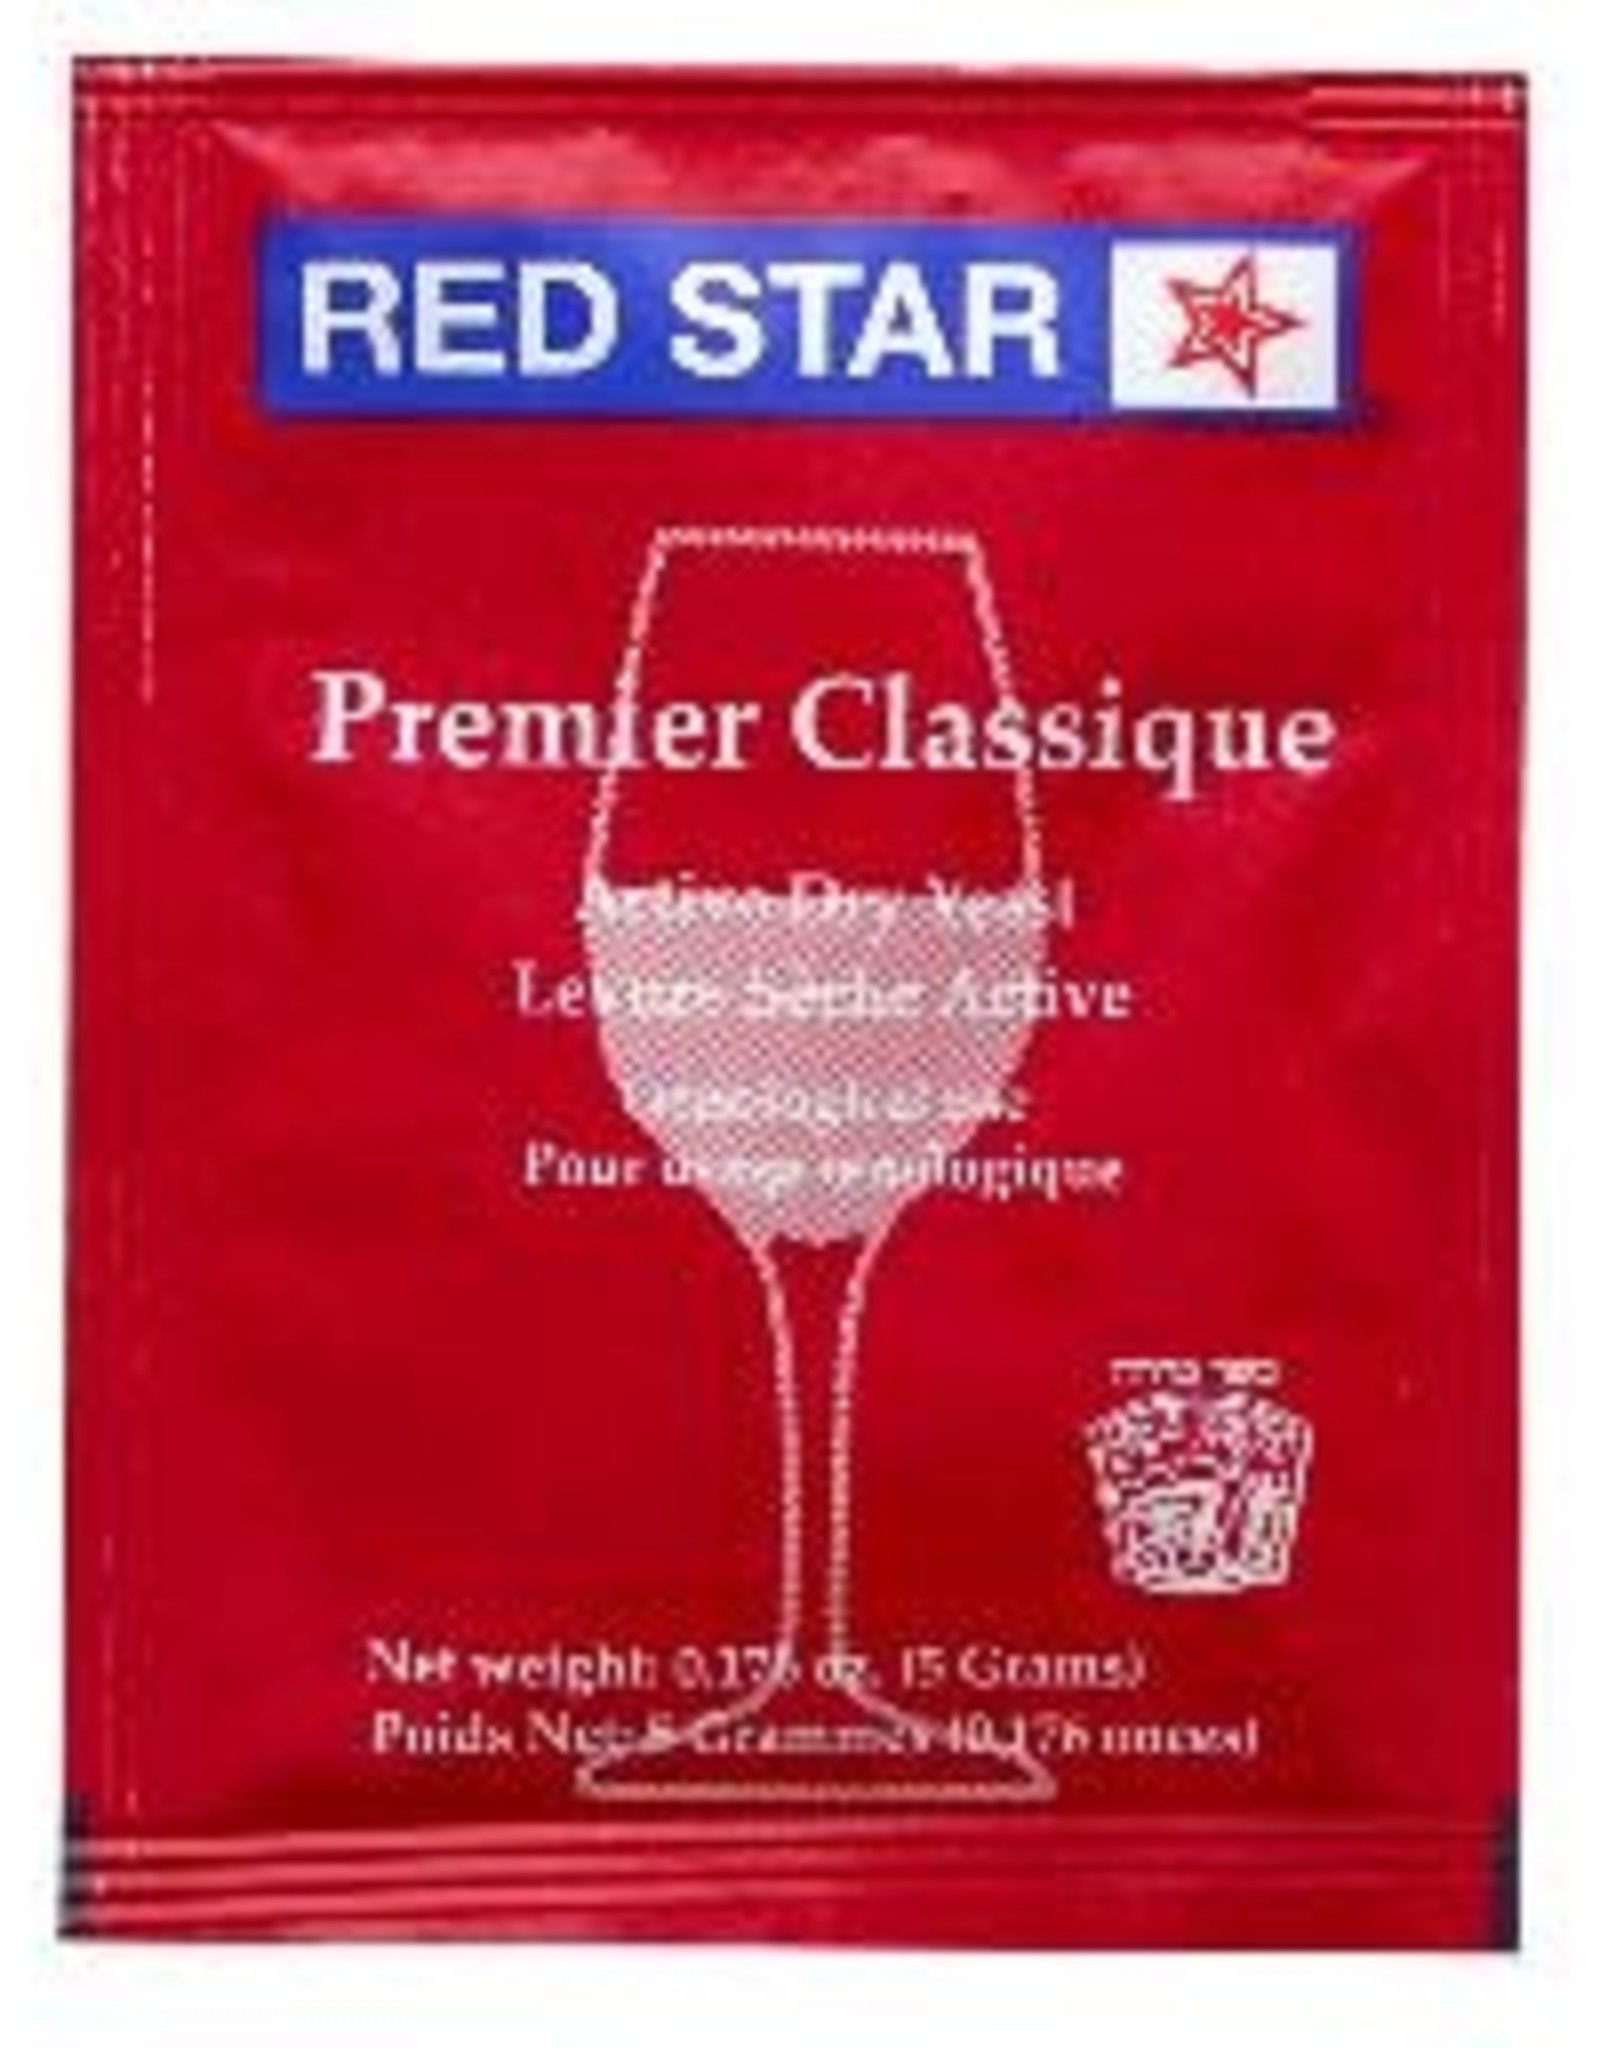 PREMIER CLASSIQUE RED STAR